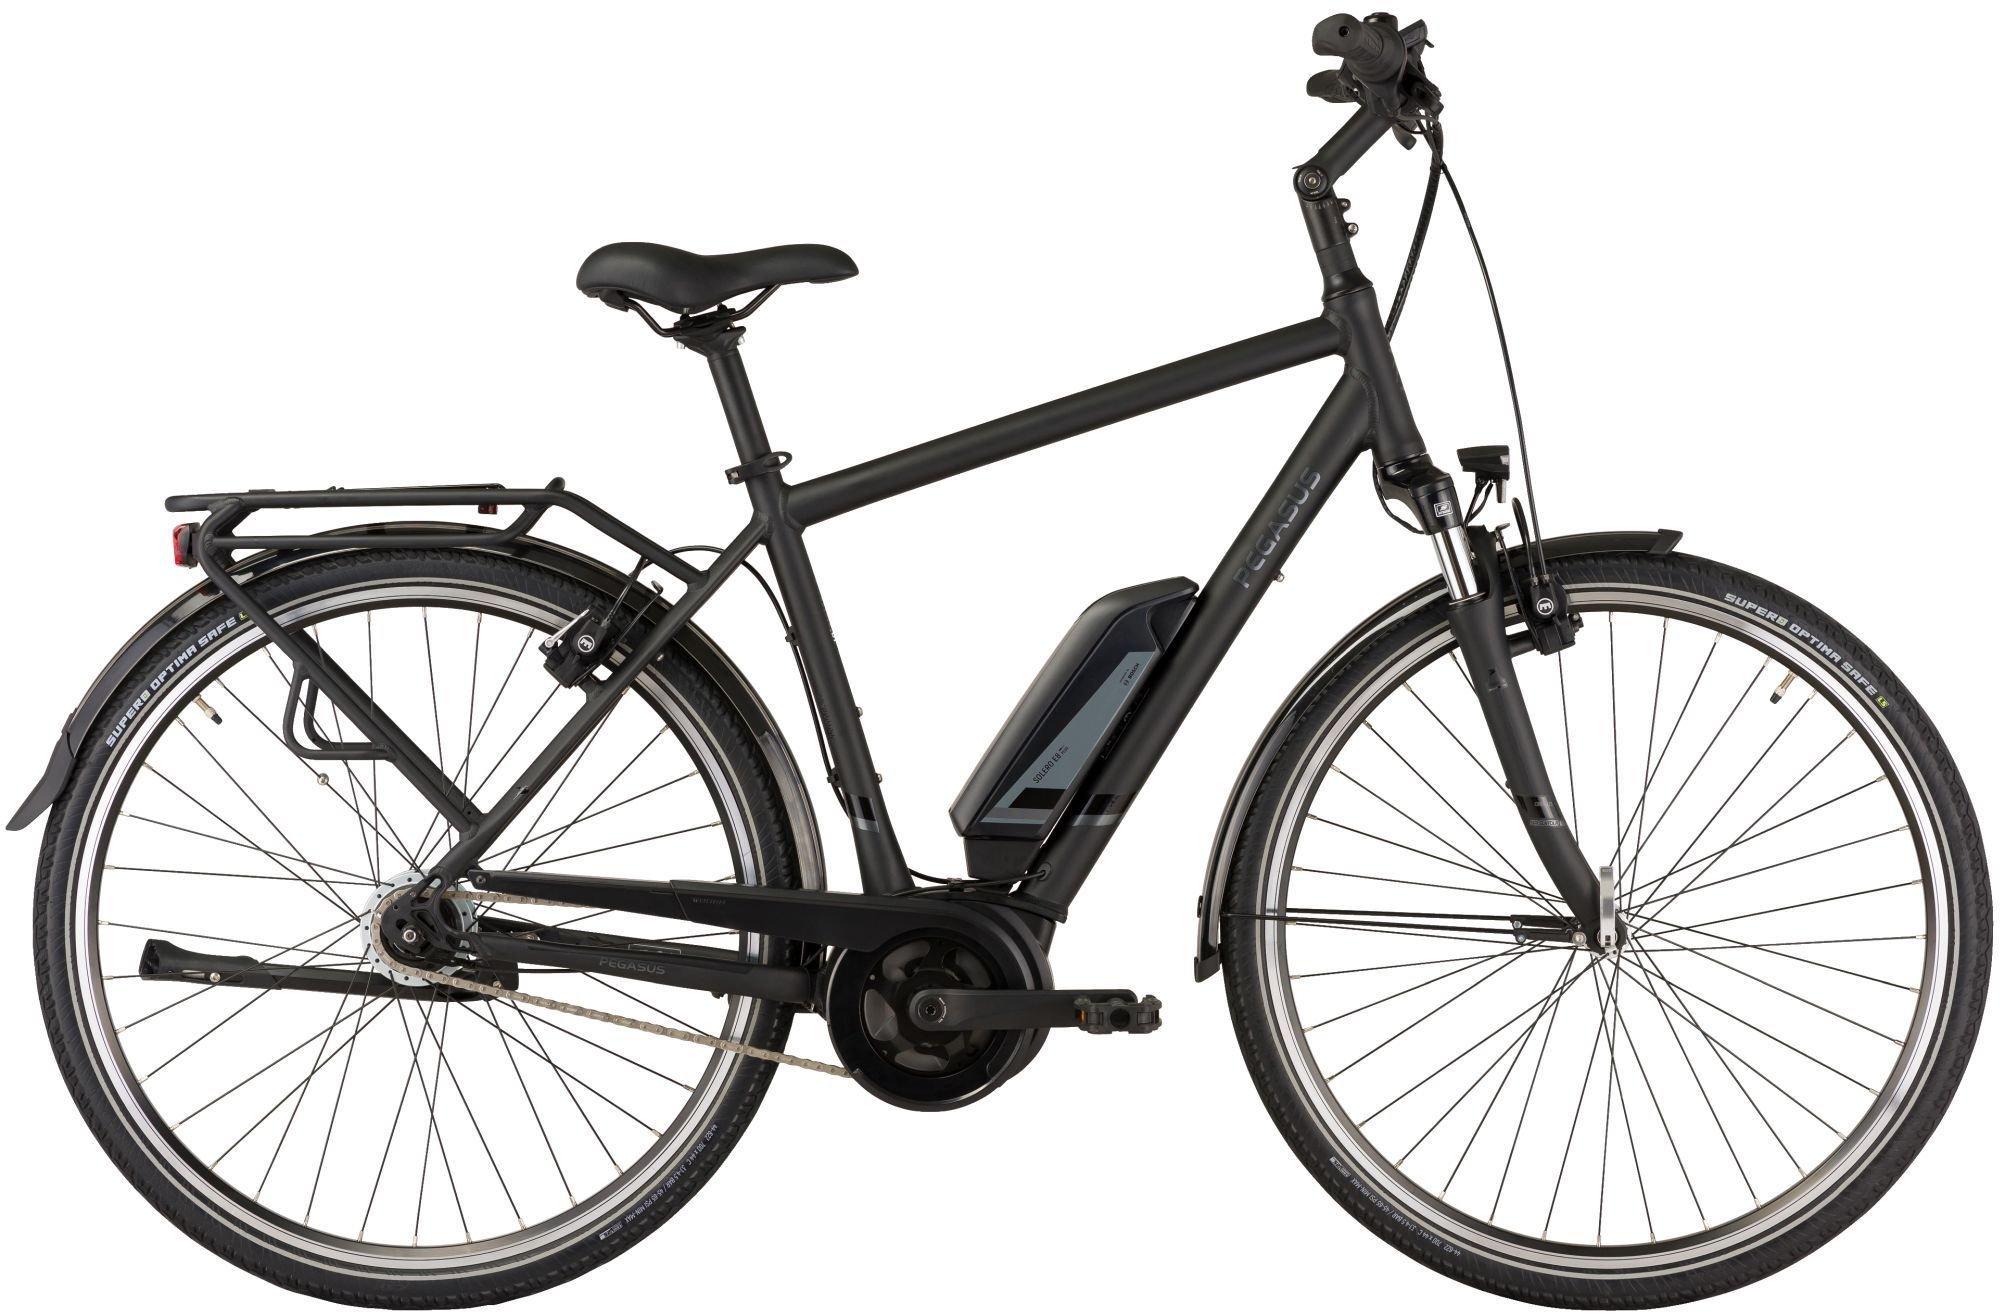 E-Bikes/Citybikes: Diamant  Solero E8R Plus (400 Wh) 8 Gang Nabenschaltung Herrenfahrrad Diamant Modell 2021 28 Zoll 58 cm